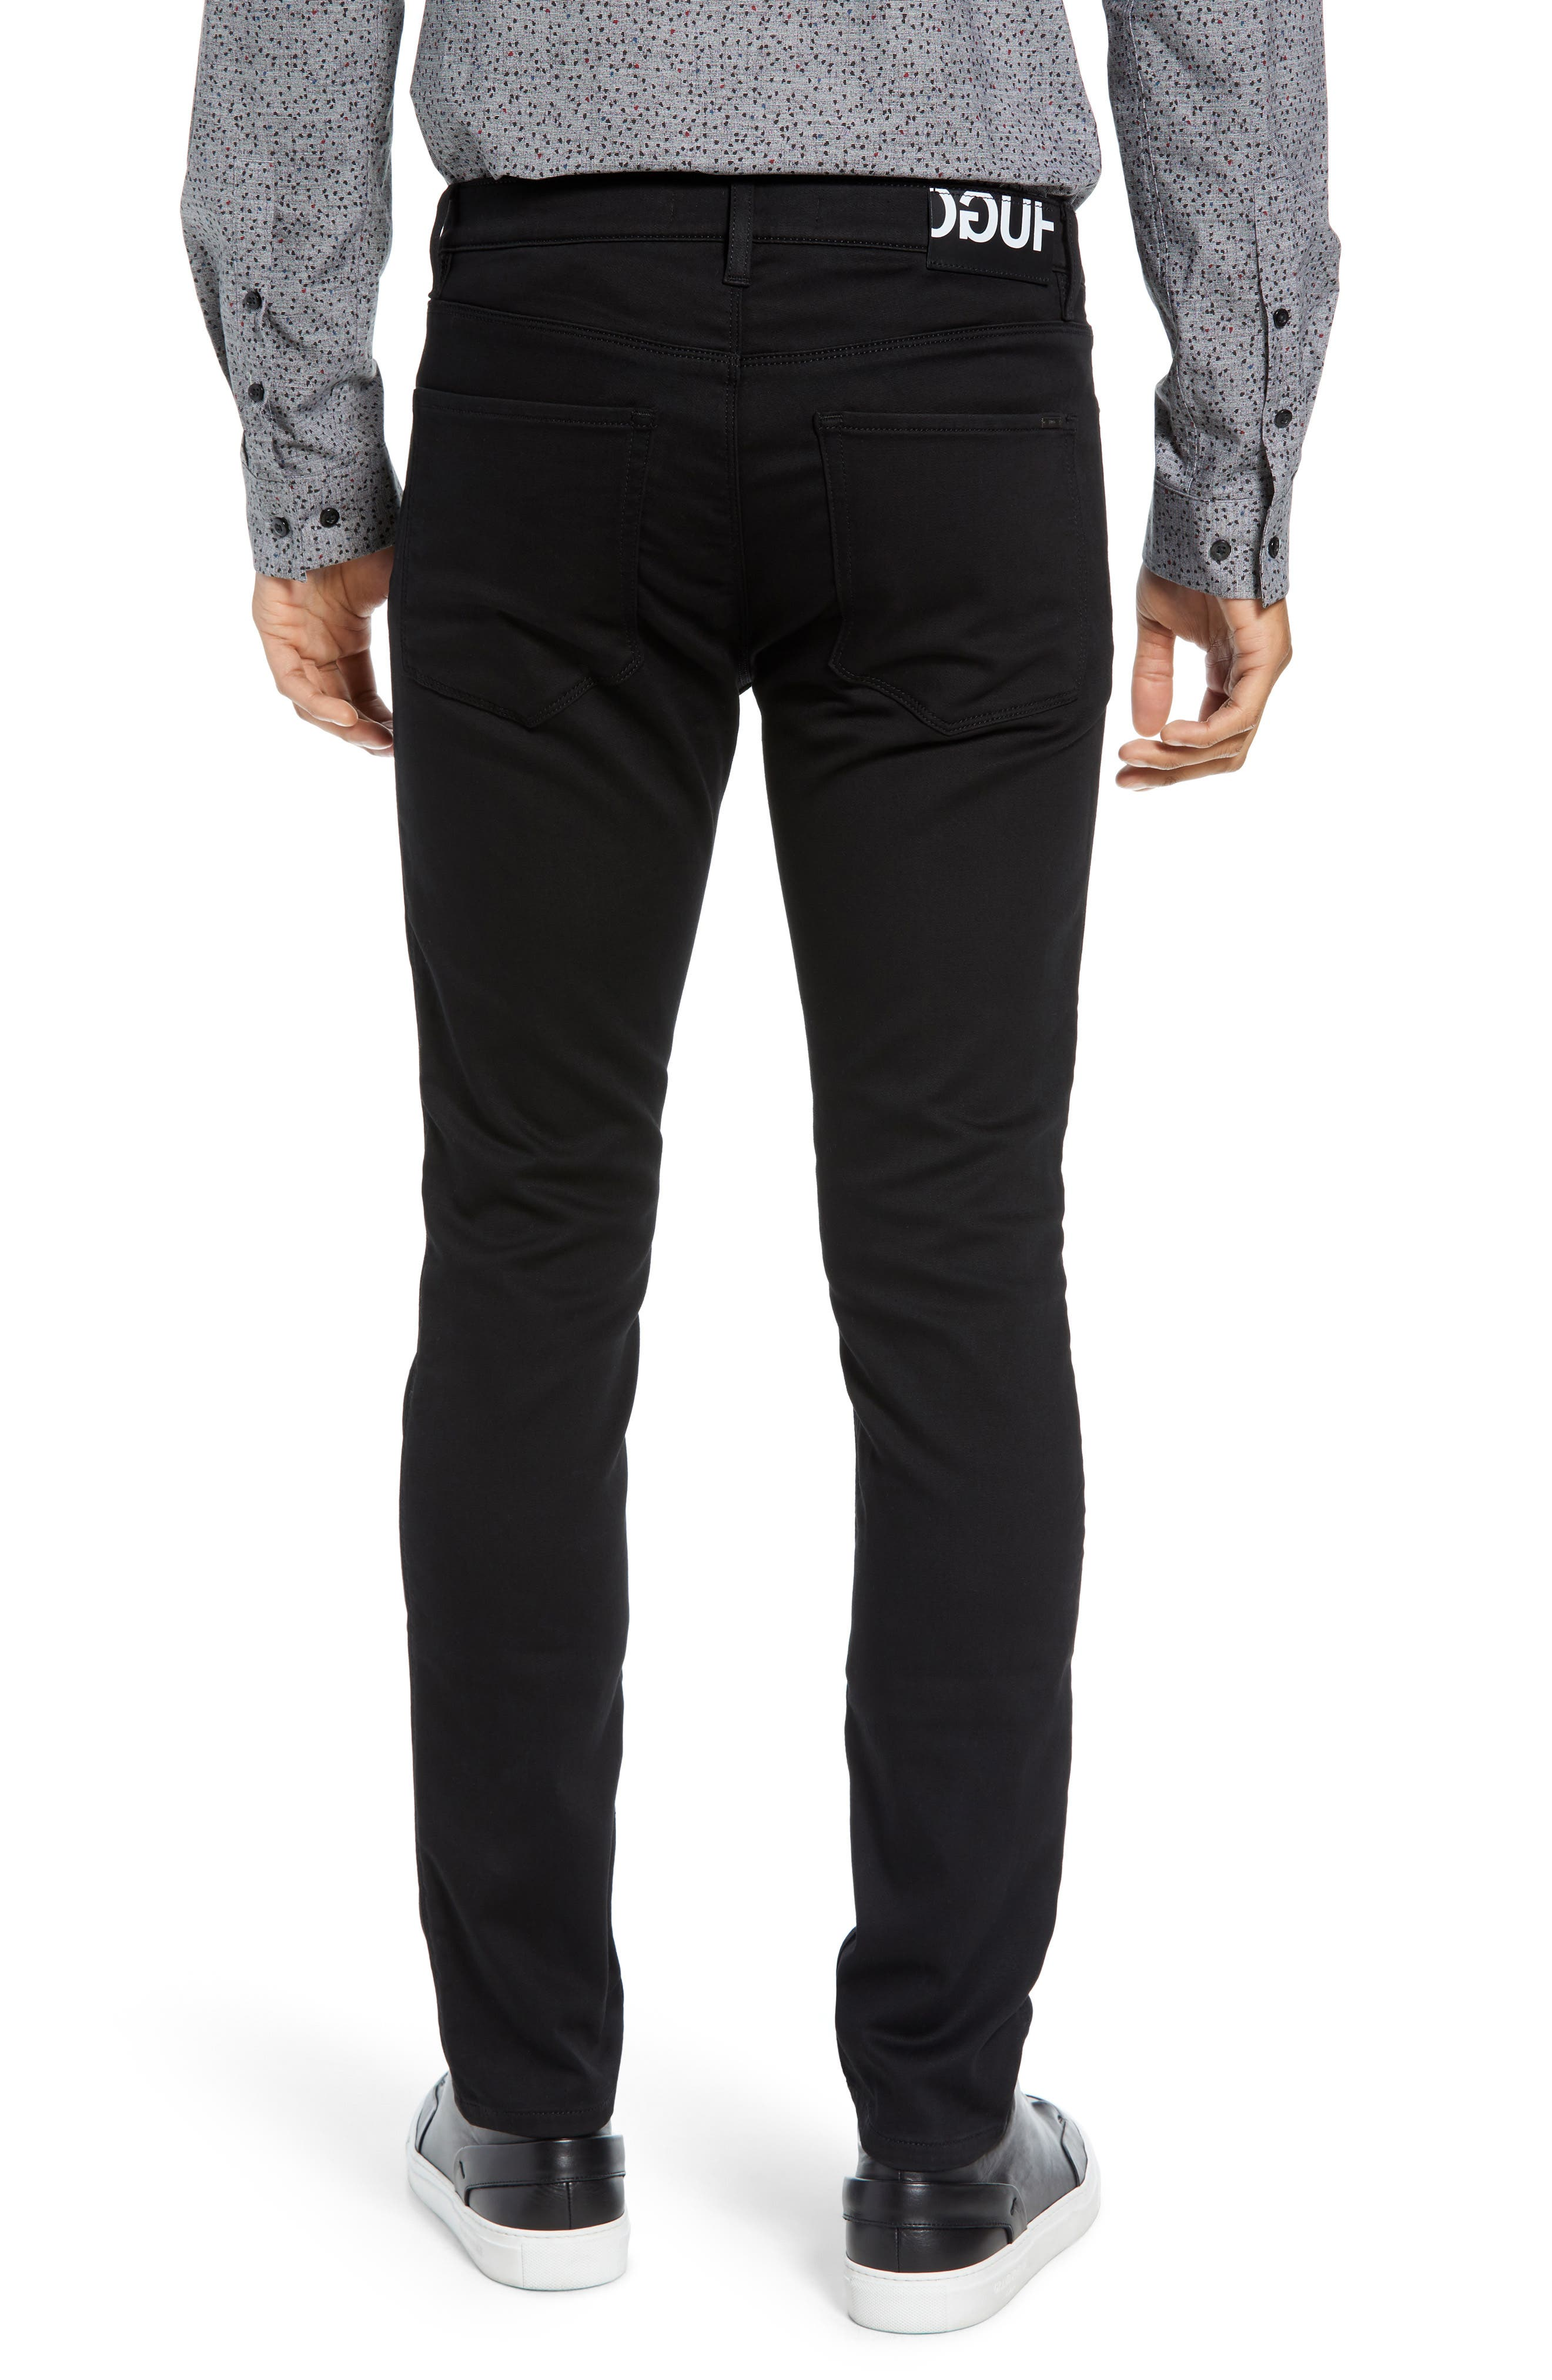 734 Skinny Fit Jeans,                             Alternate thumbnail 2, color,                             BLACK